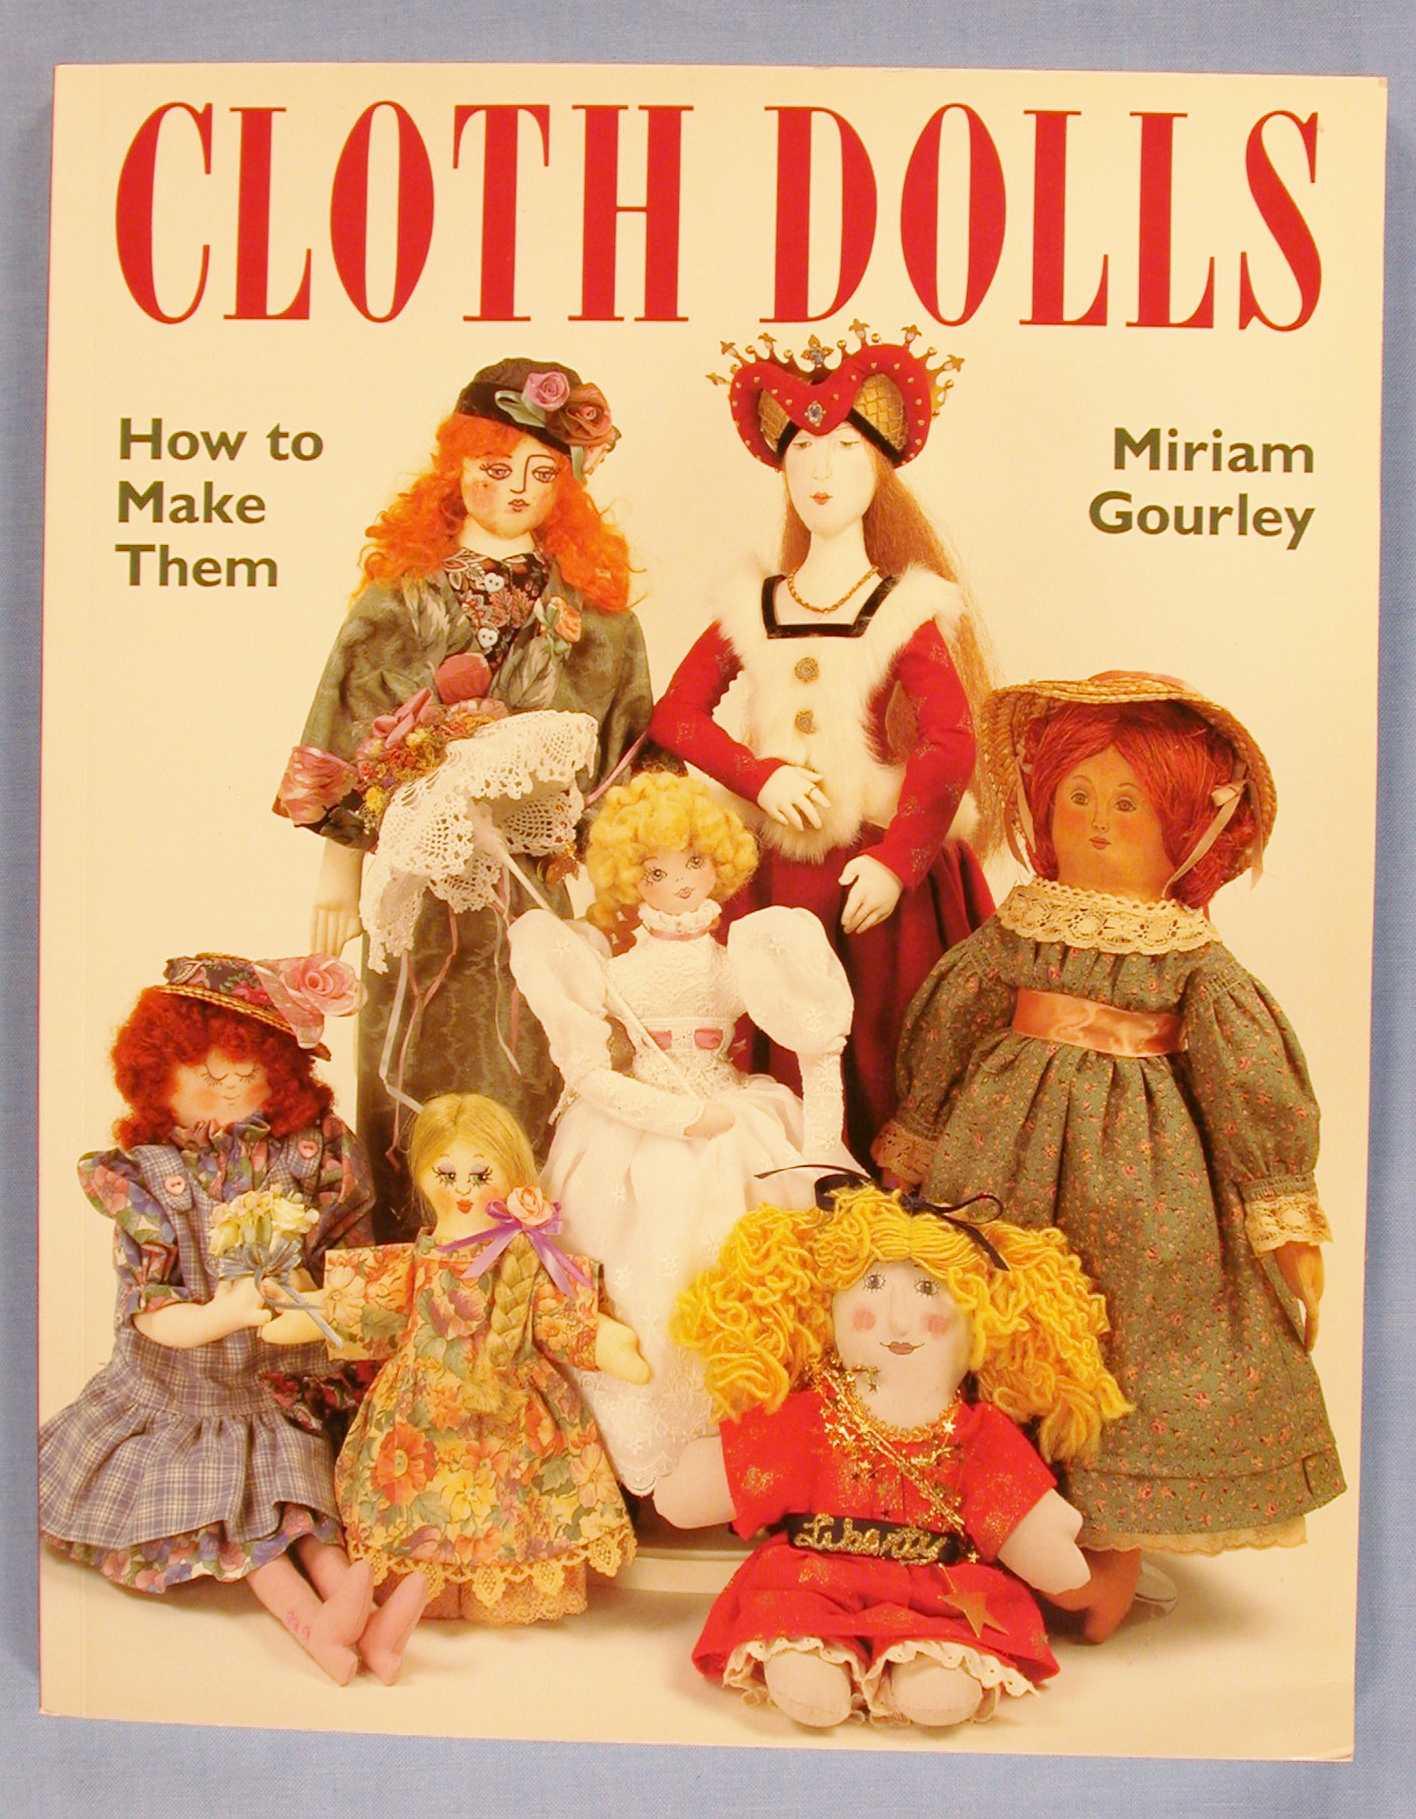 Cloth Dolls: How to Make Them, Gourley, Miriam